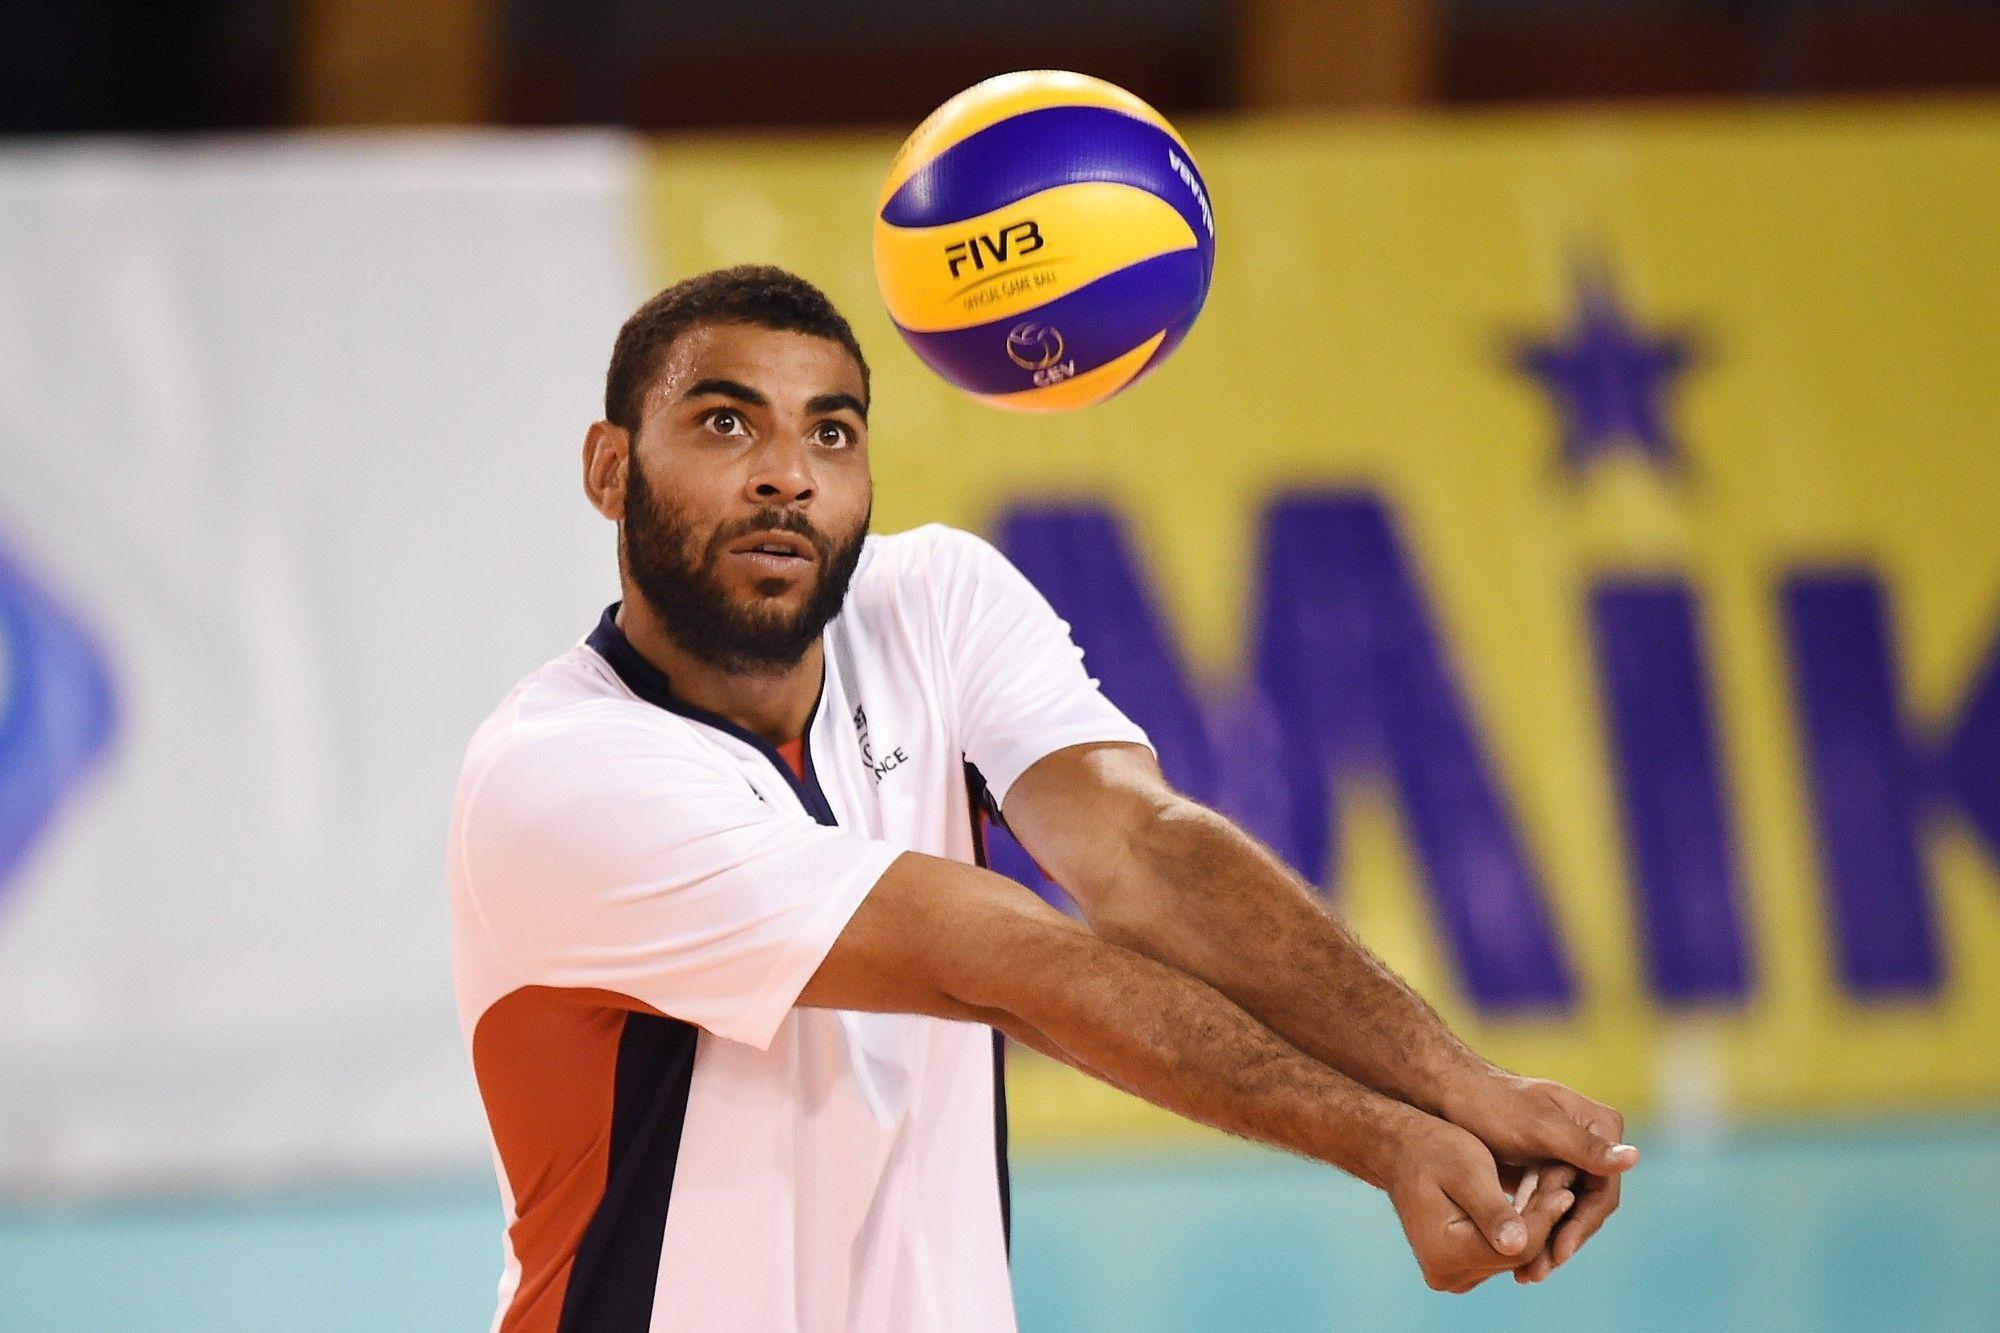 Earvin Ngapeth La Star Francaise Du Volley Arretee Au Bresil En 2020 Star Francaise Danse Avec Les Stars Volley